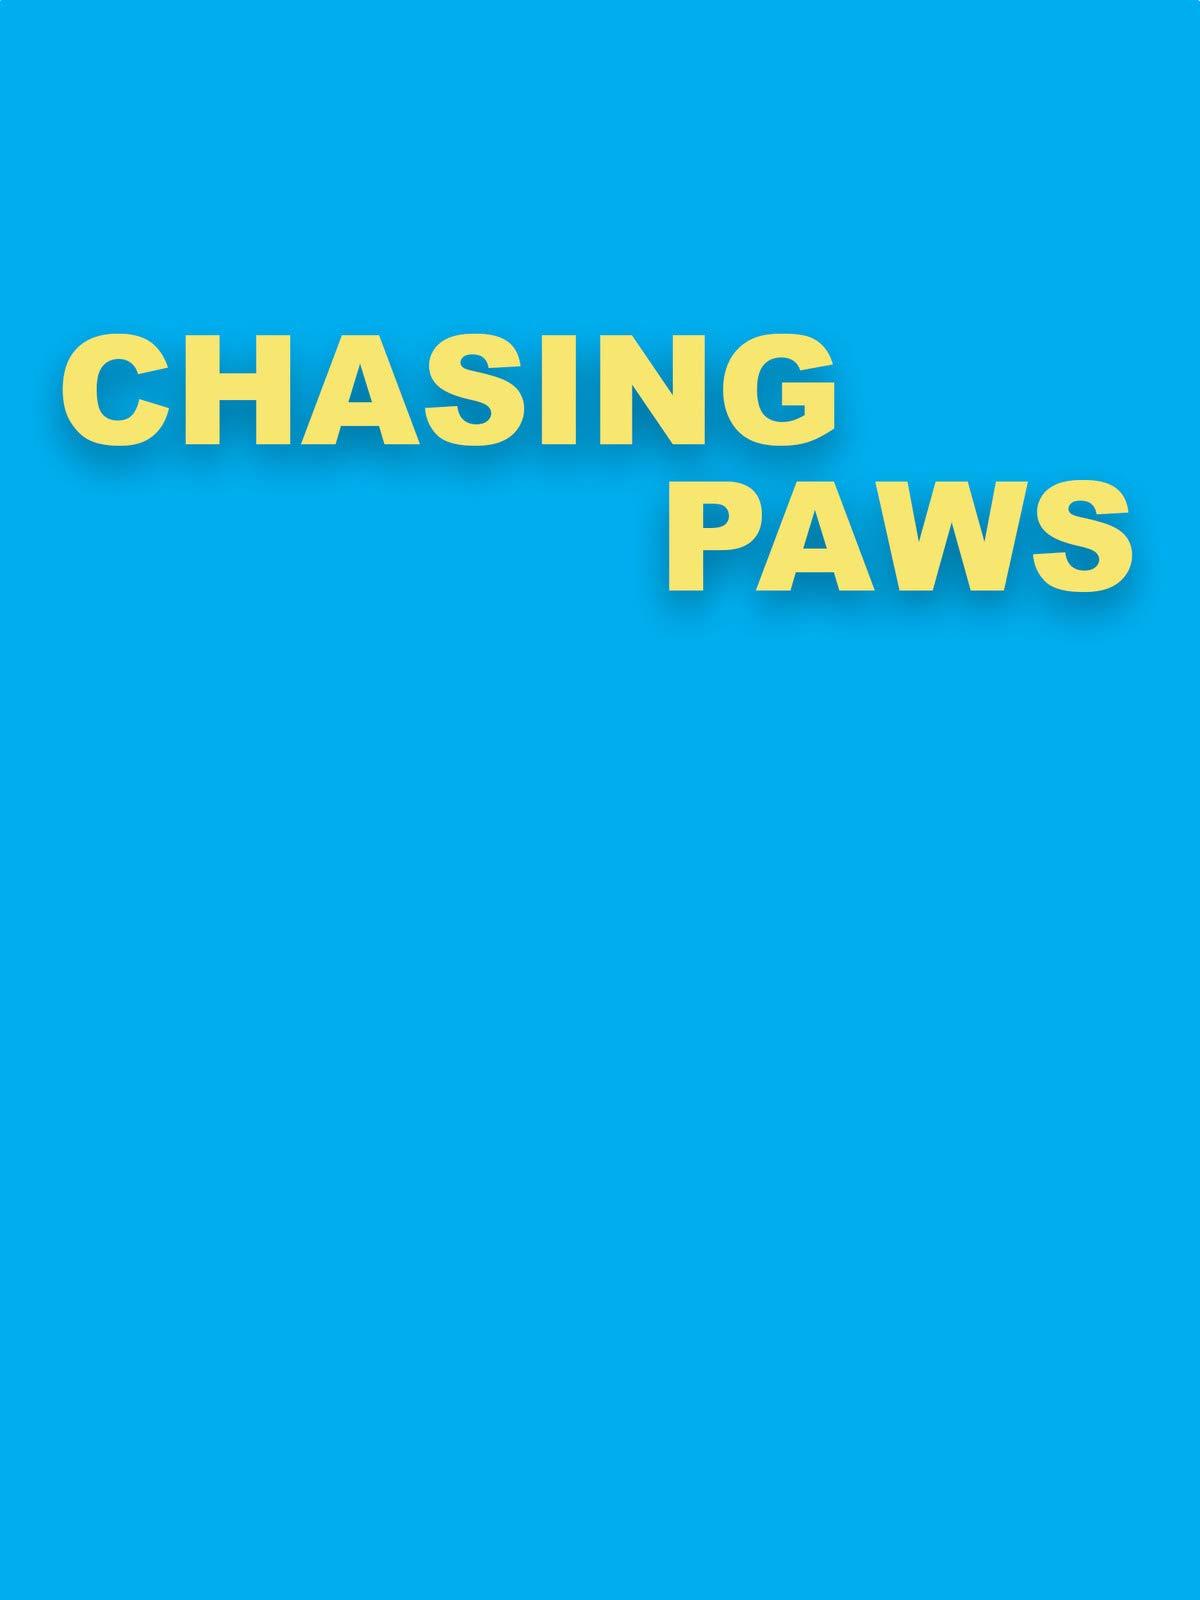 Chasing Paws